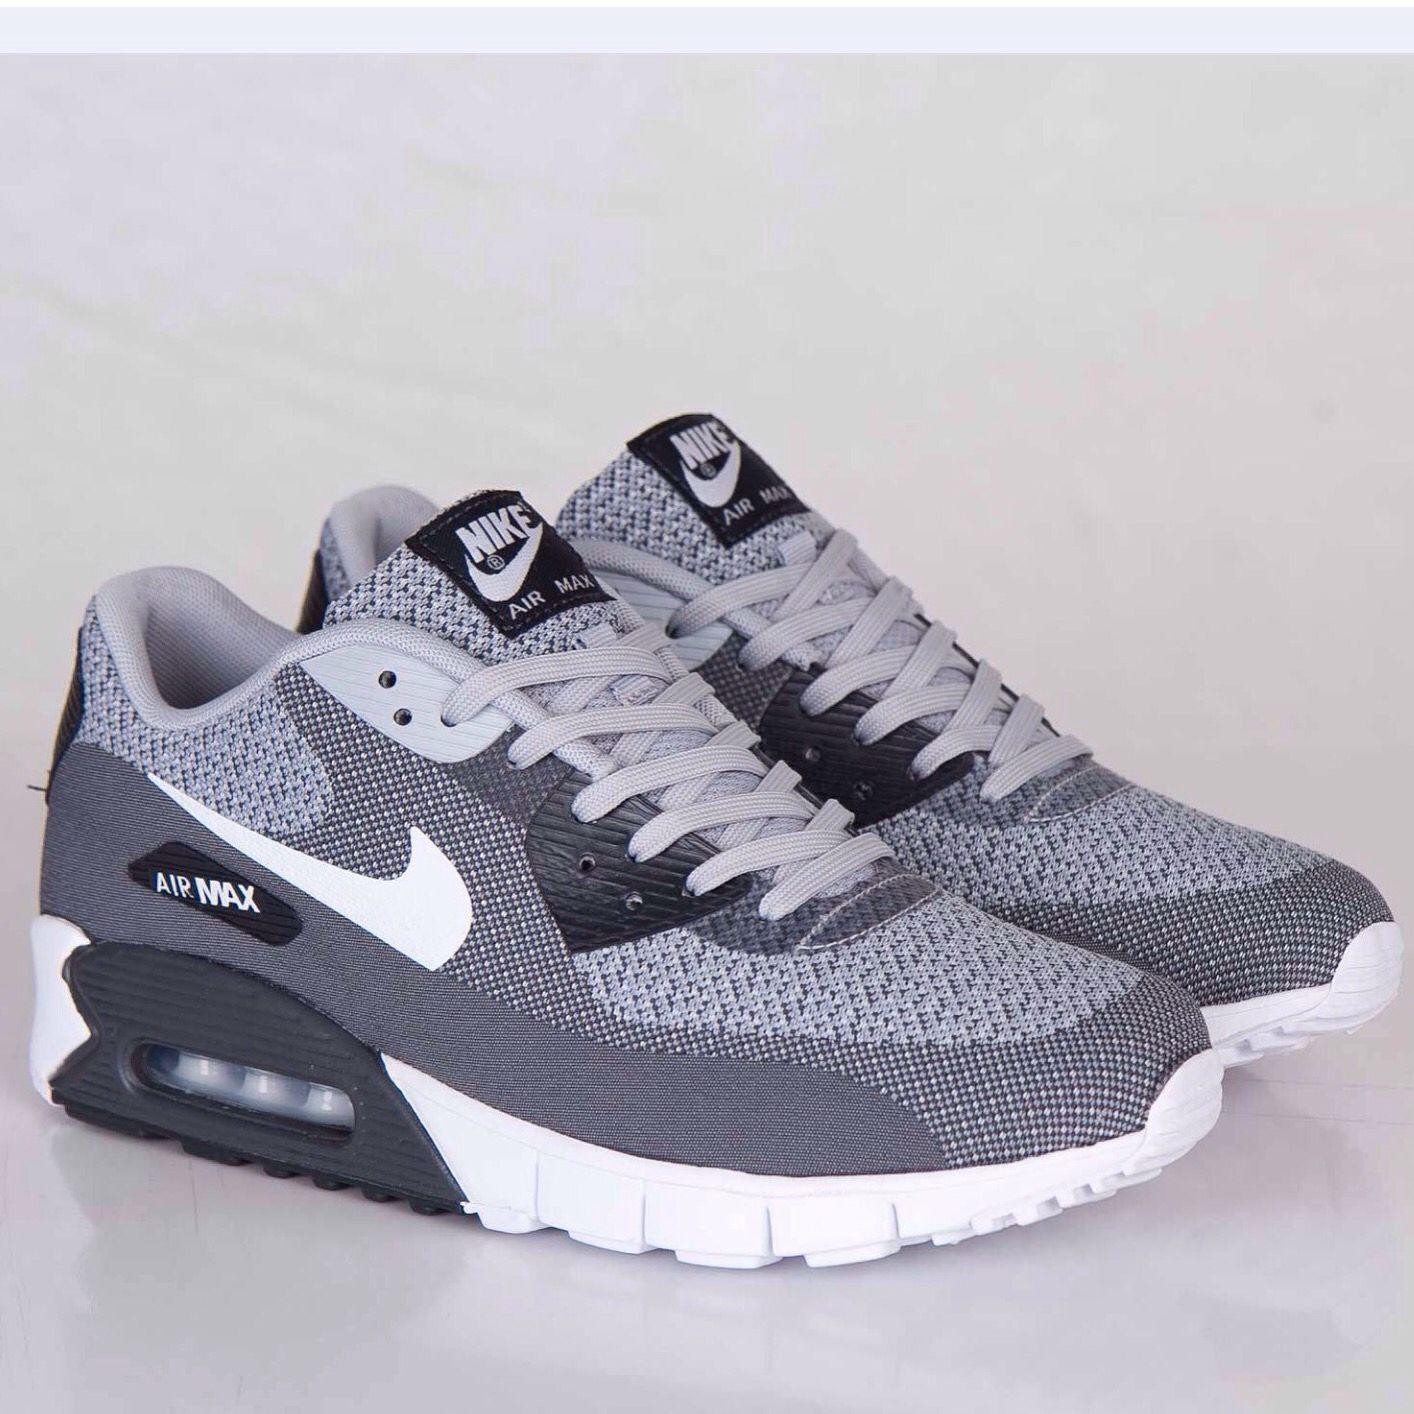 Nike Airmax, tonos grises   Nike free shoes, Nike air max, Nike